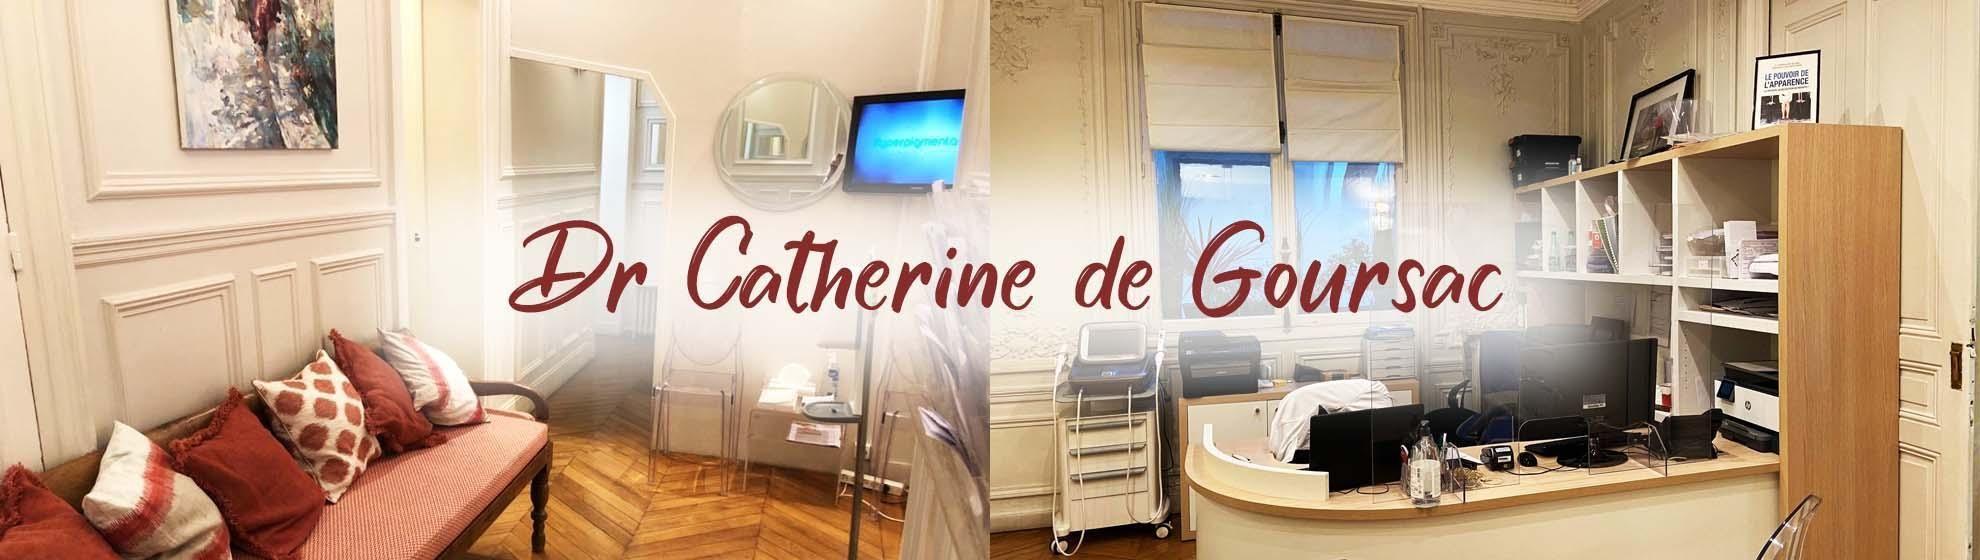 Dr Catherine de Goursac